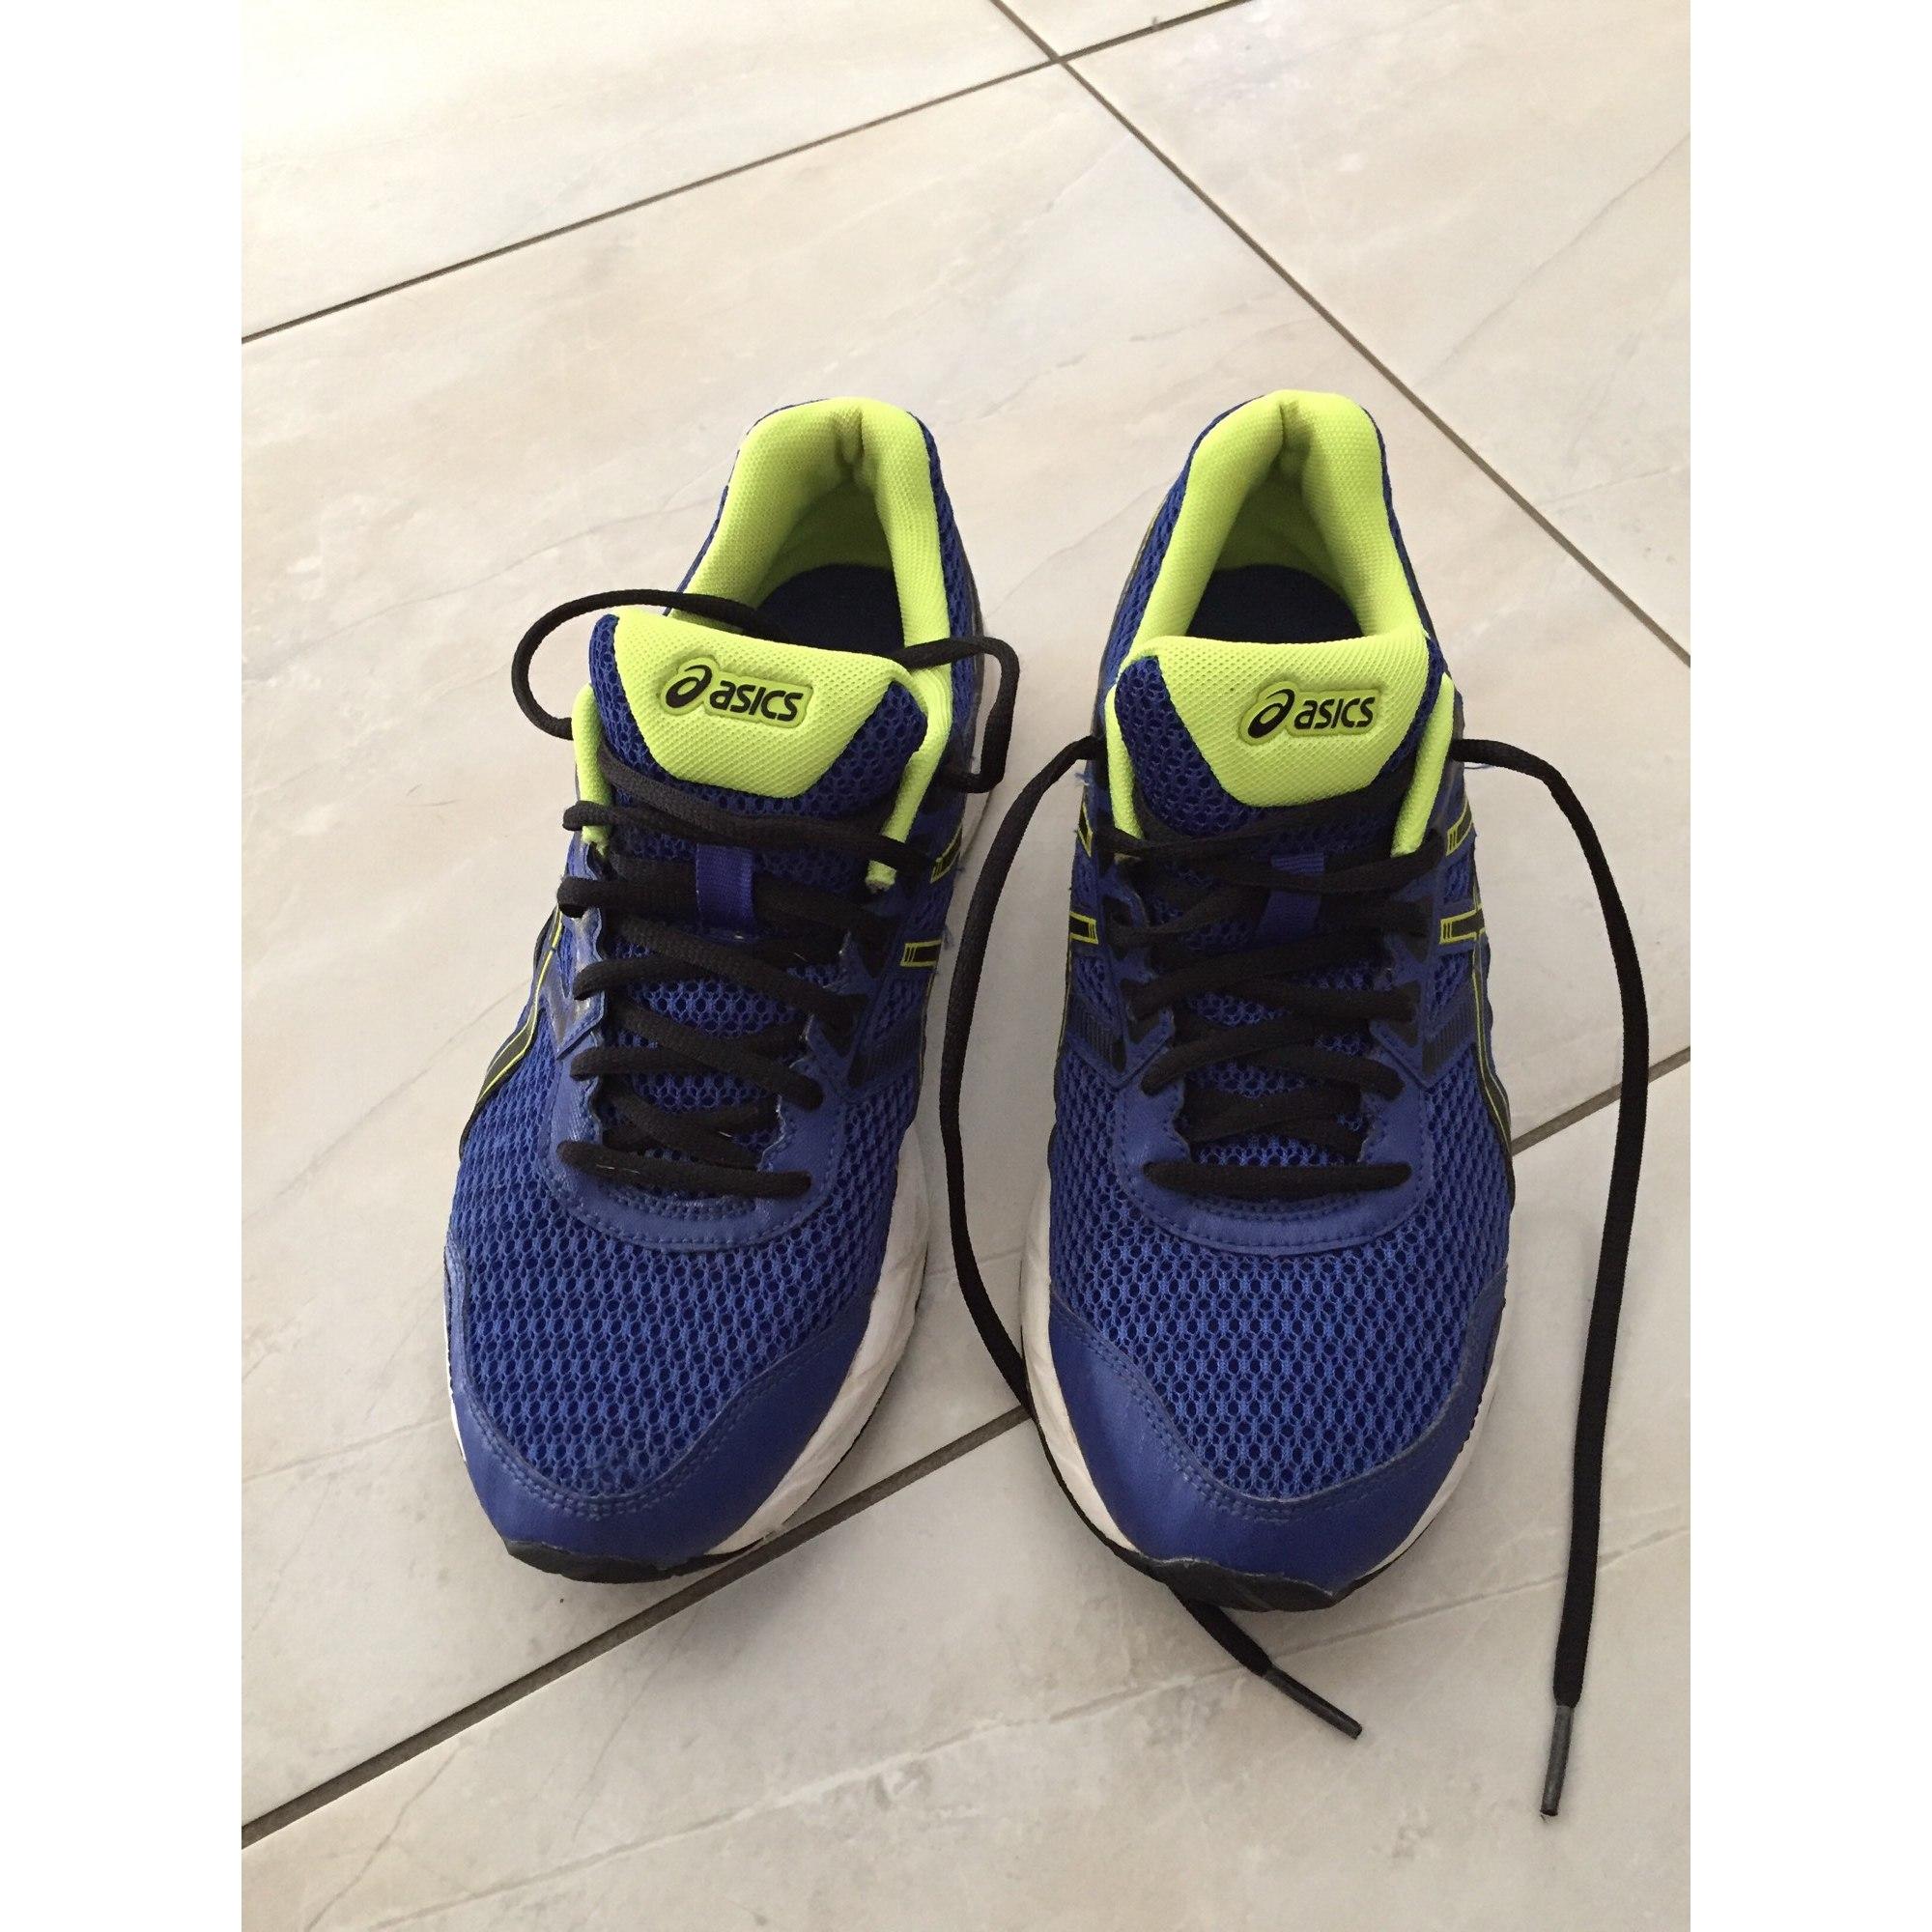 Baskets ASICS 40 bleu vendu par Molinie - 7231163